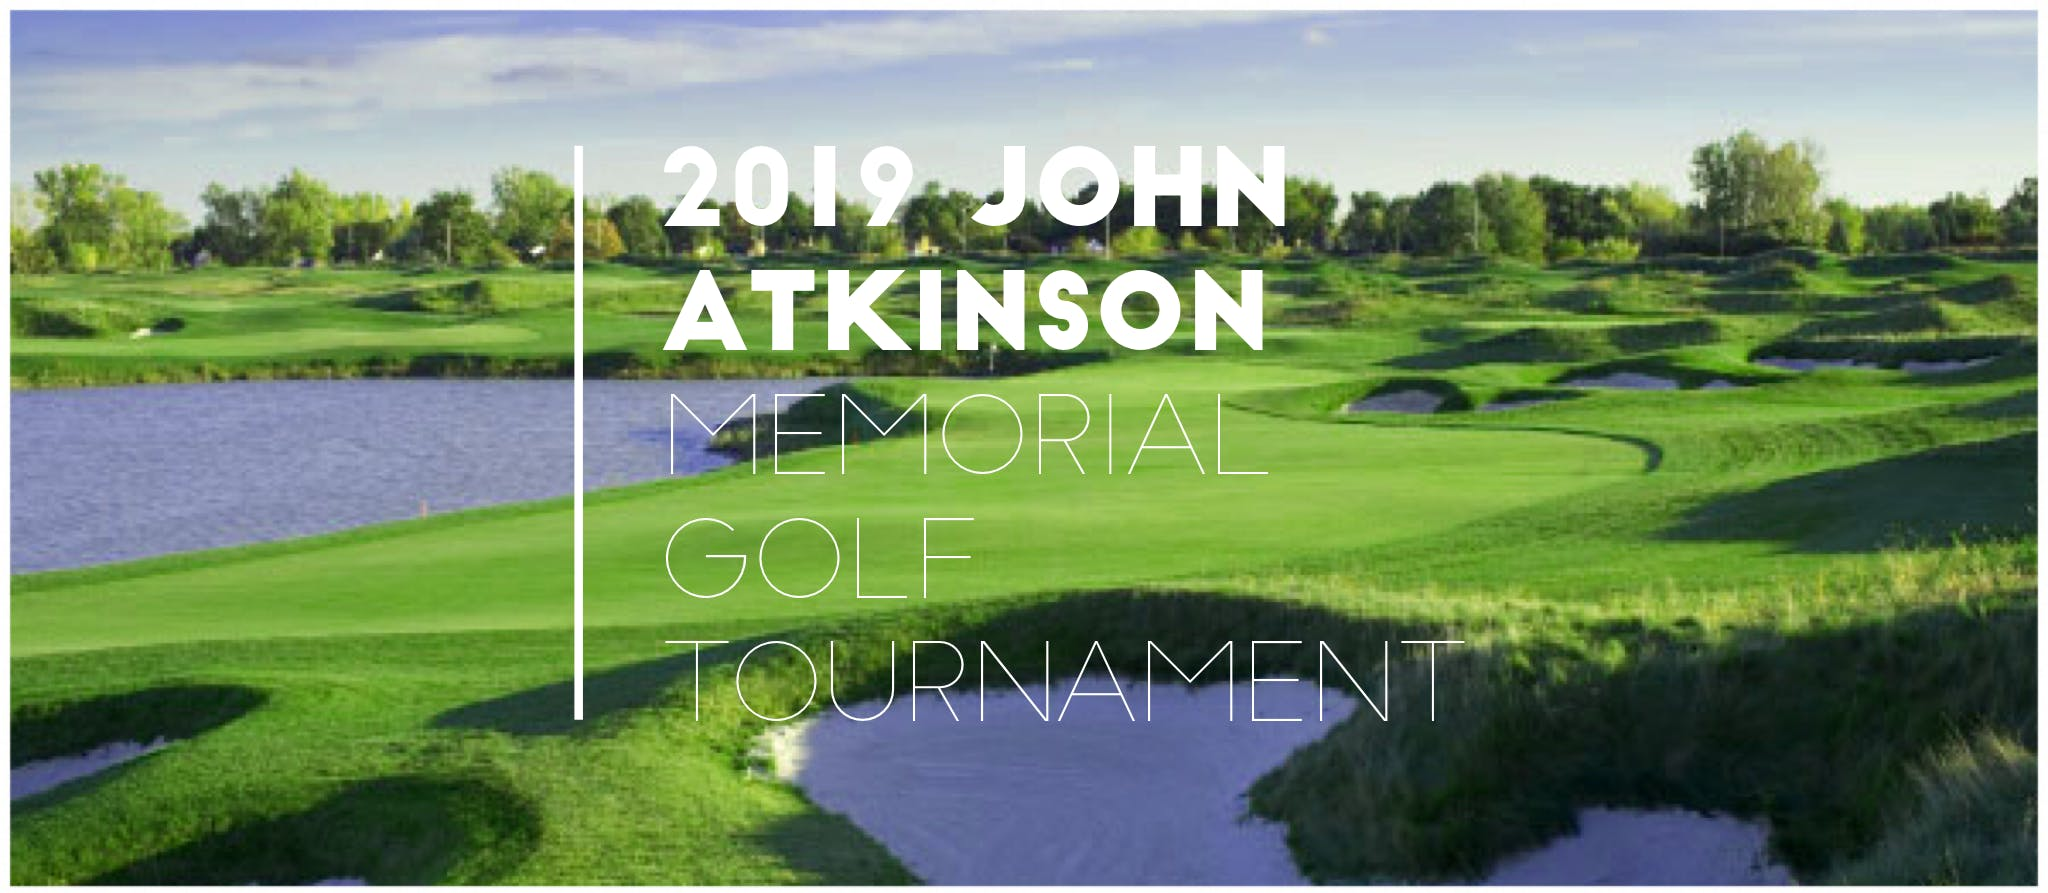 2019 john atkinson memorial golf tournament scramble hunter. Black Bedroom Furniture Sets. Home Design Ideas